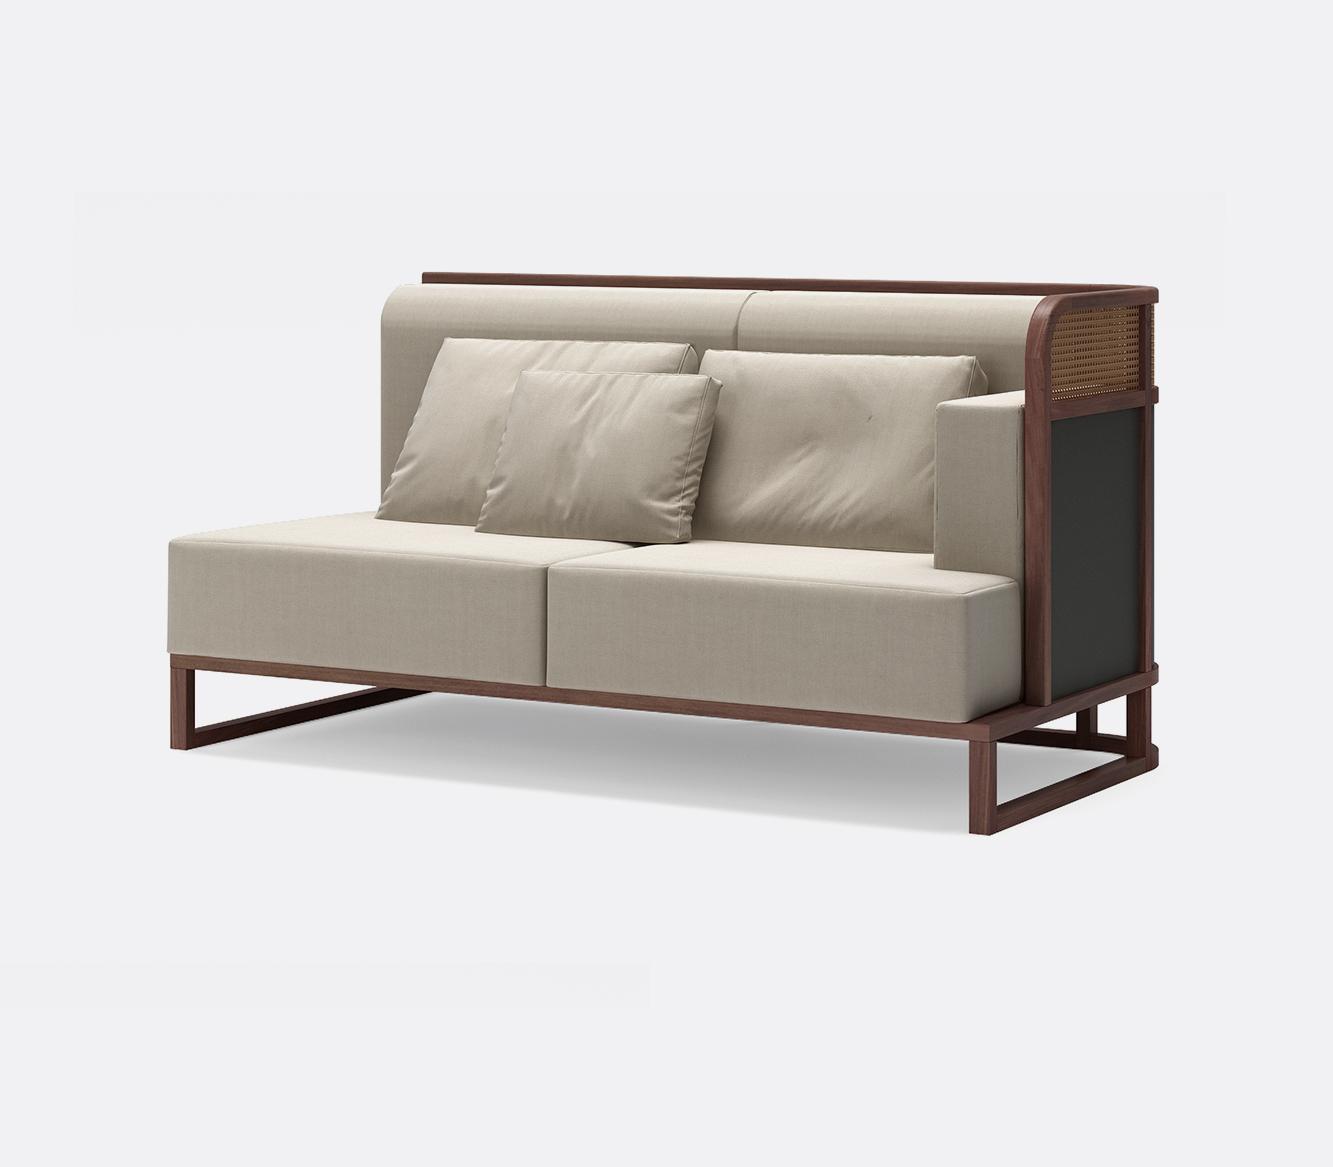 皮尔先生组合沙发  Y-53b1 / b2